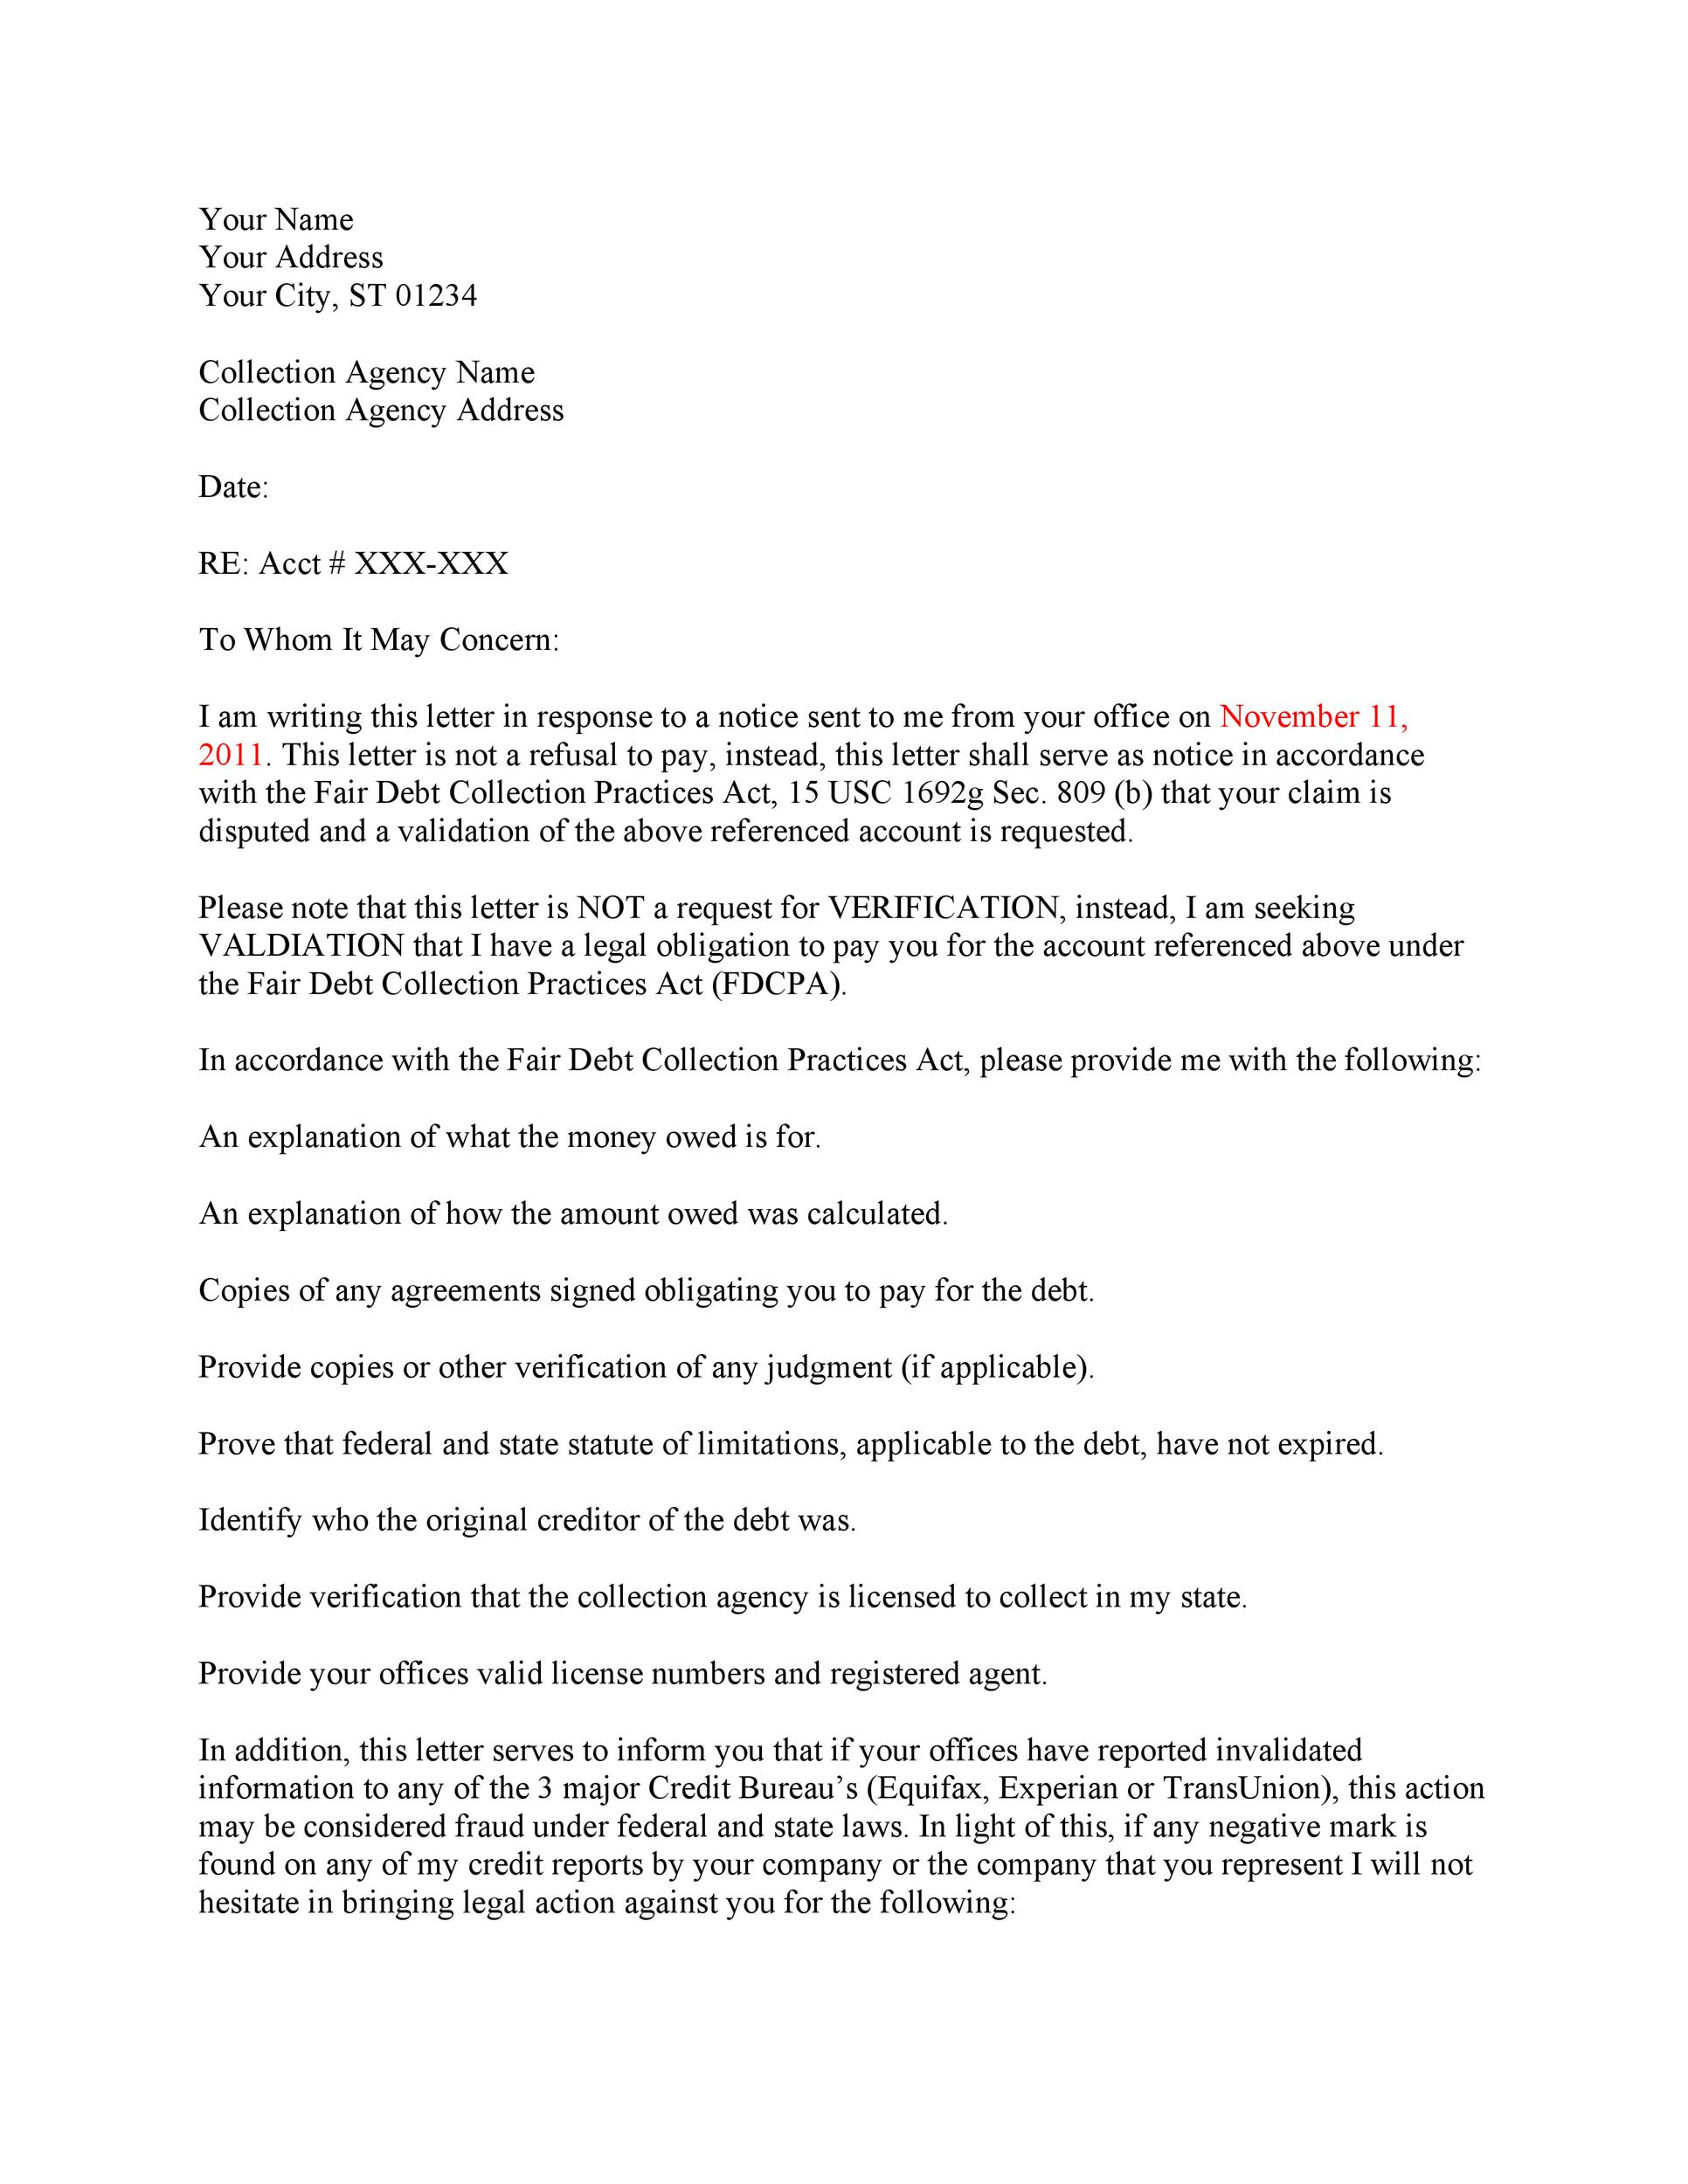 Free debt validation letter 22